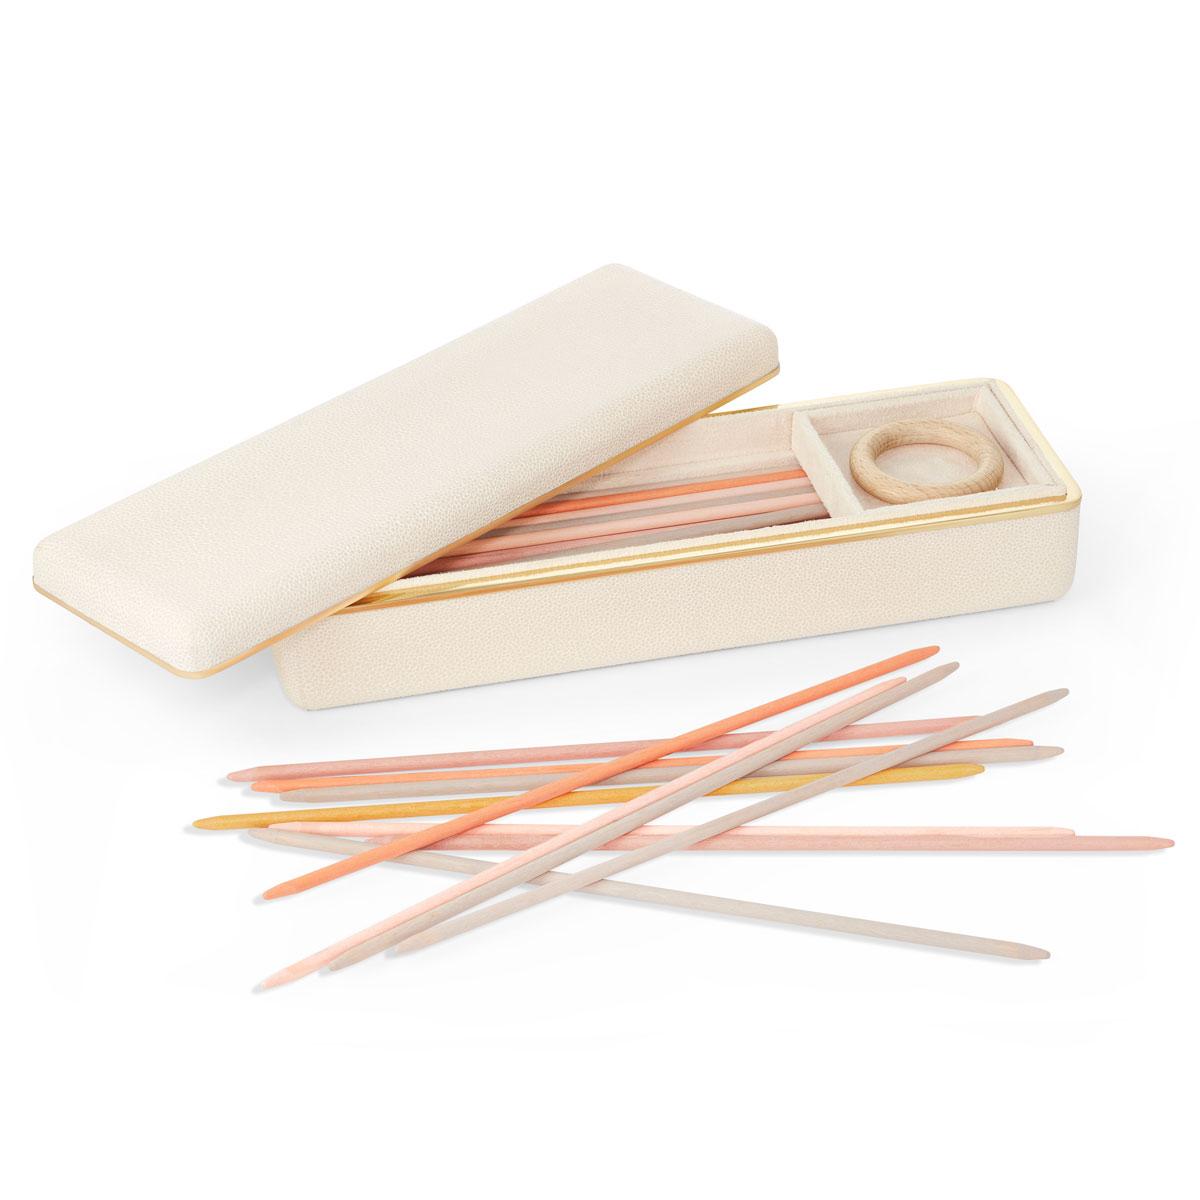 Aerin Small Shagreen Pick Up Sticks, Cream